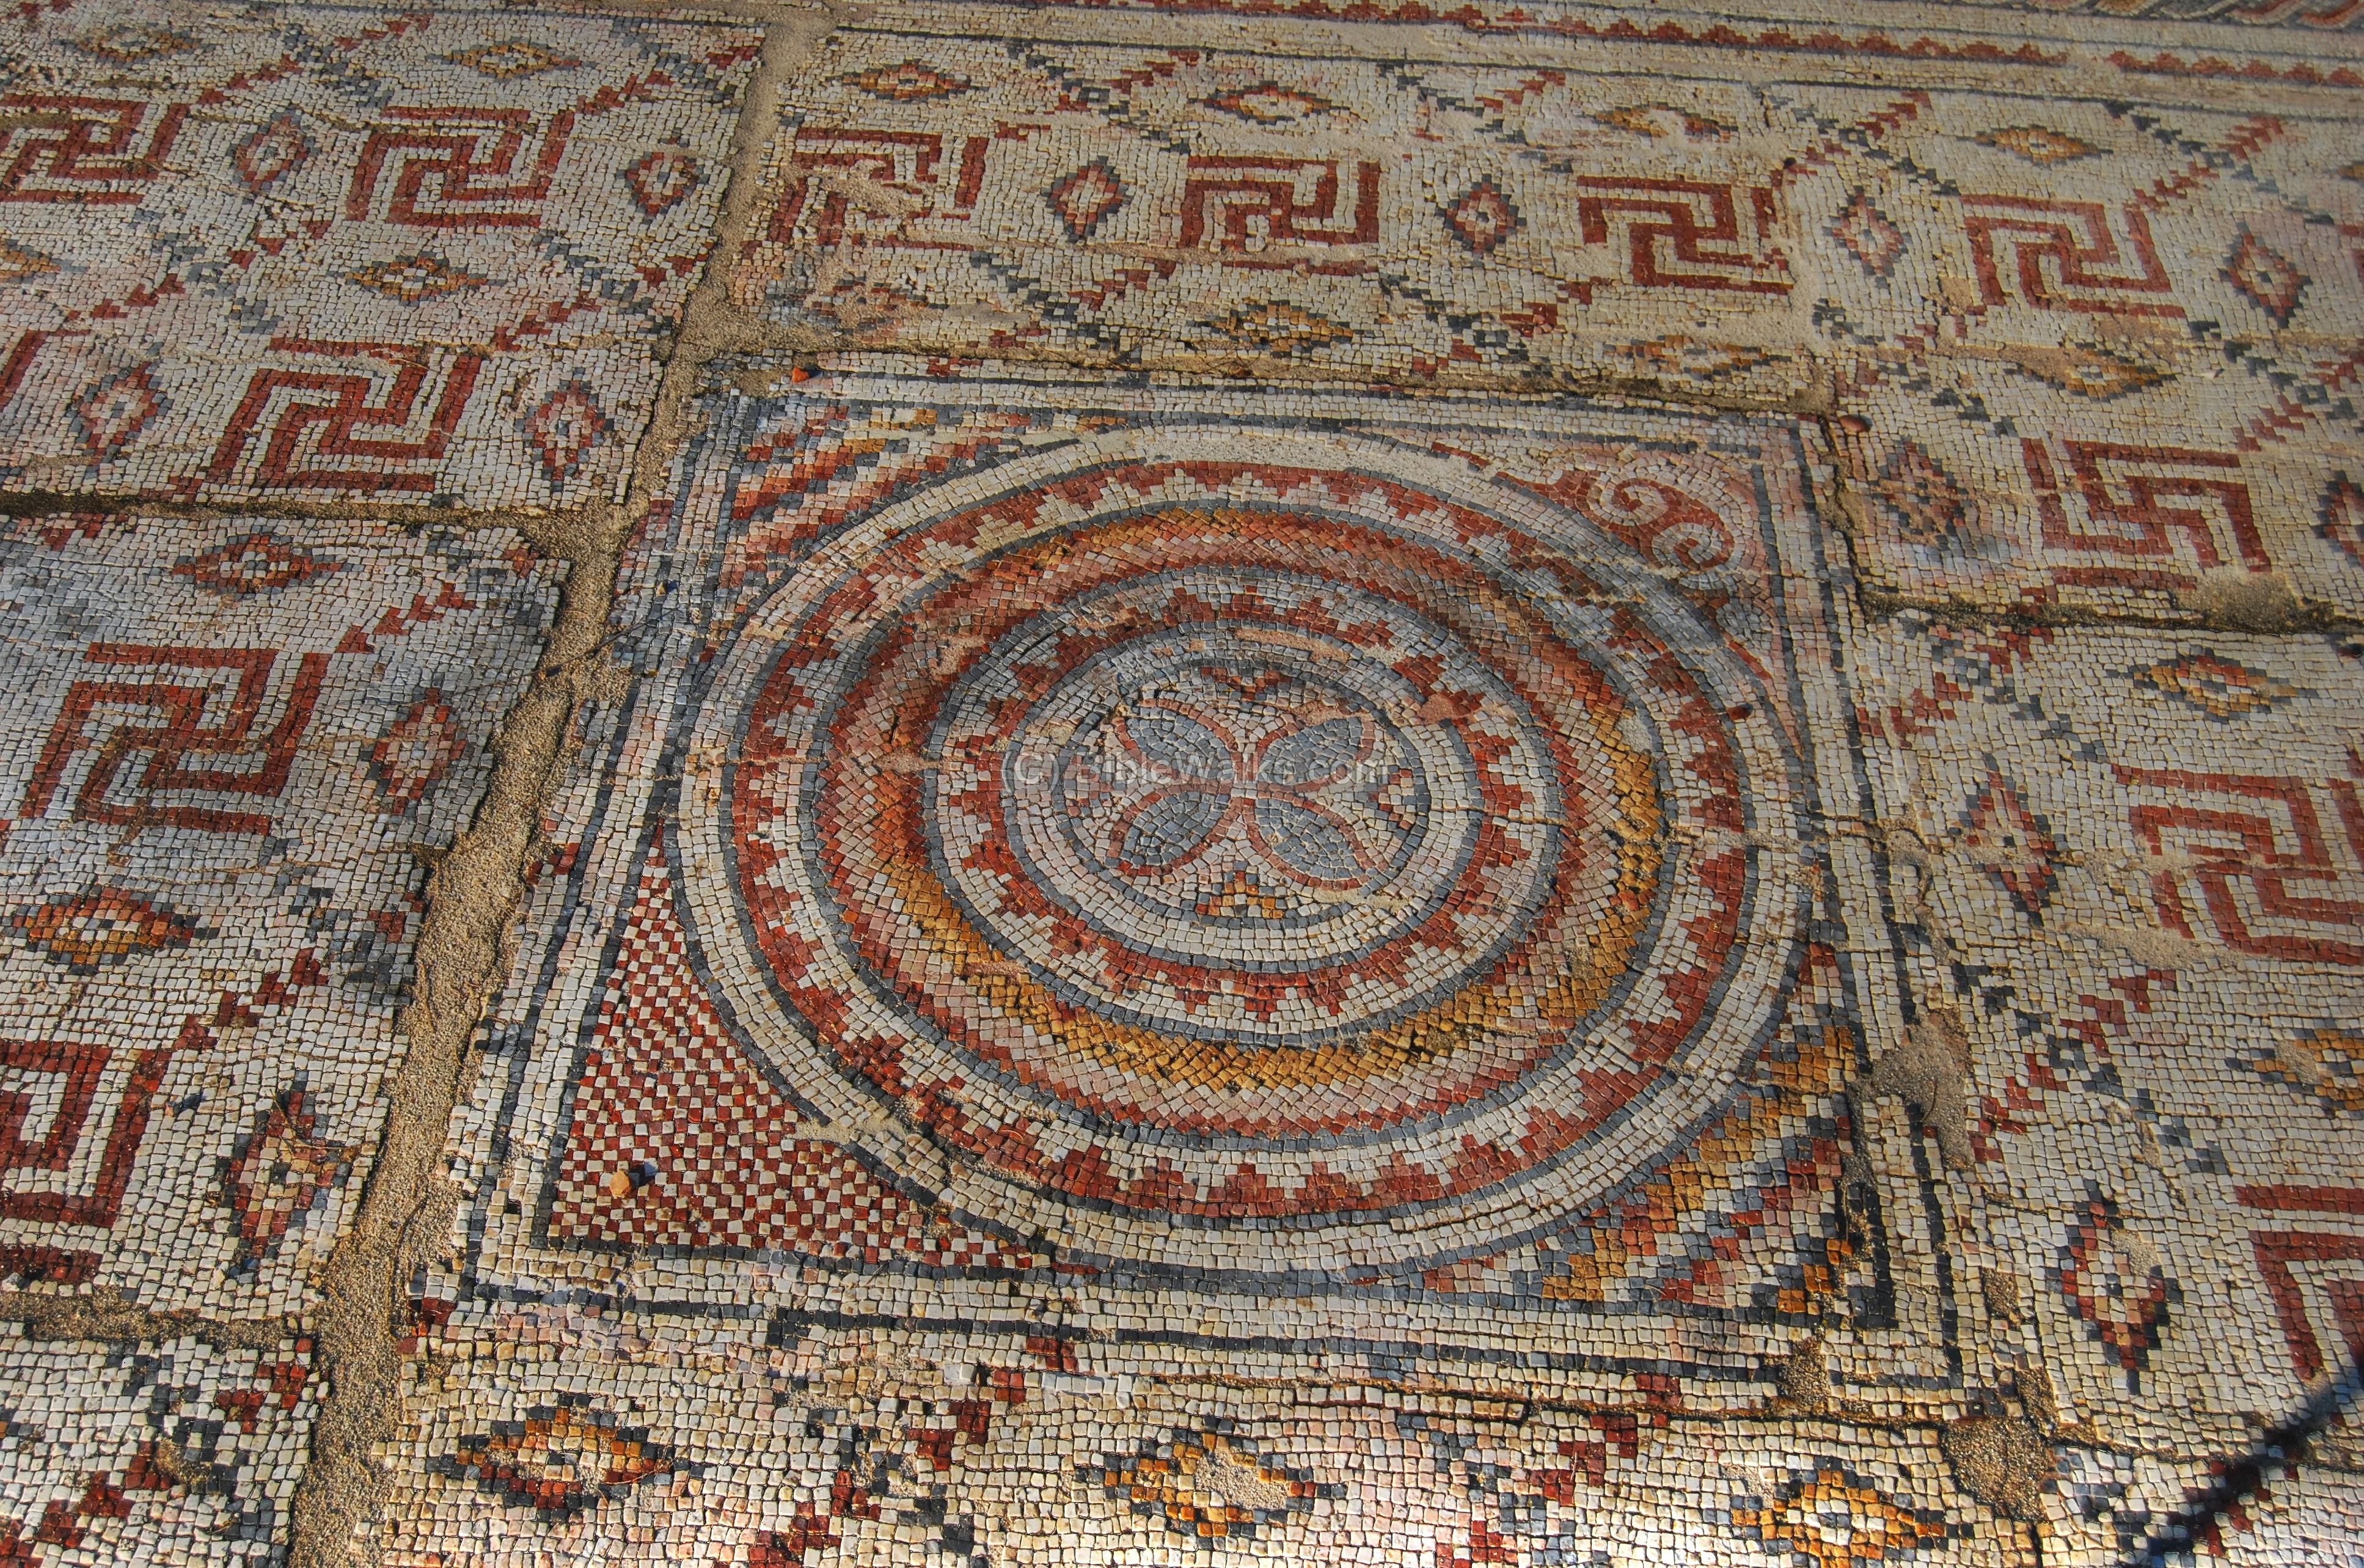 Marble Floor Patterns